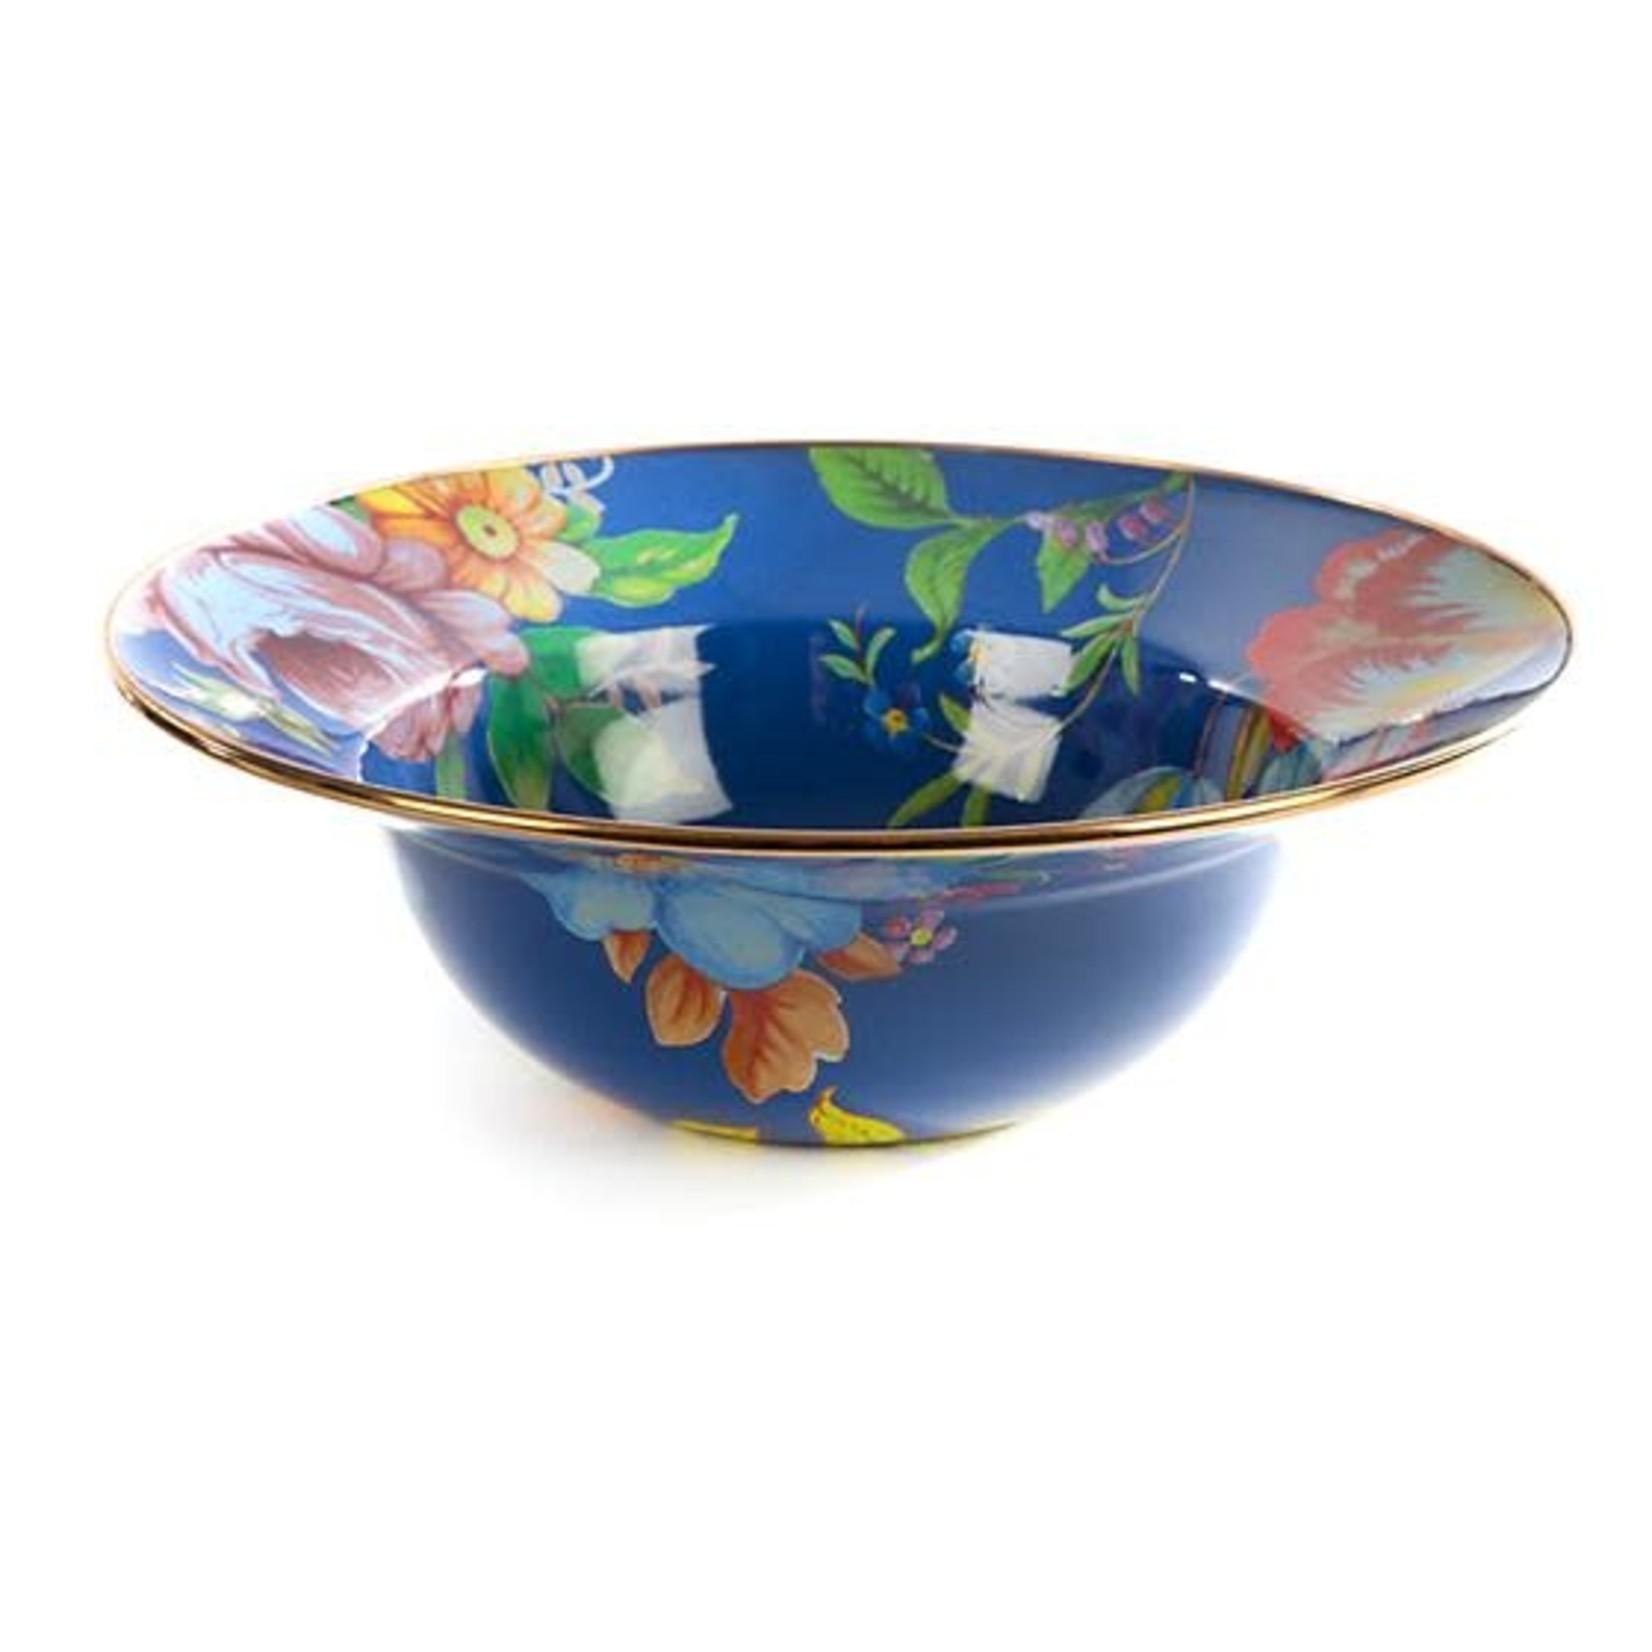 MacKenzie Childs Flower Market Serving Bowl - Lapis